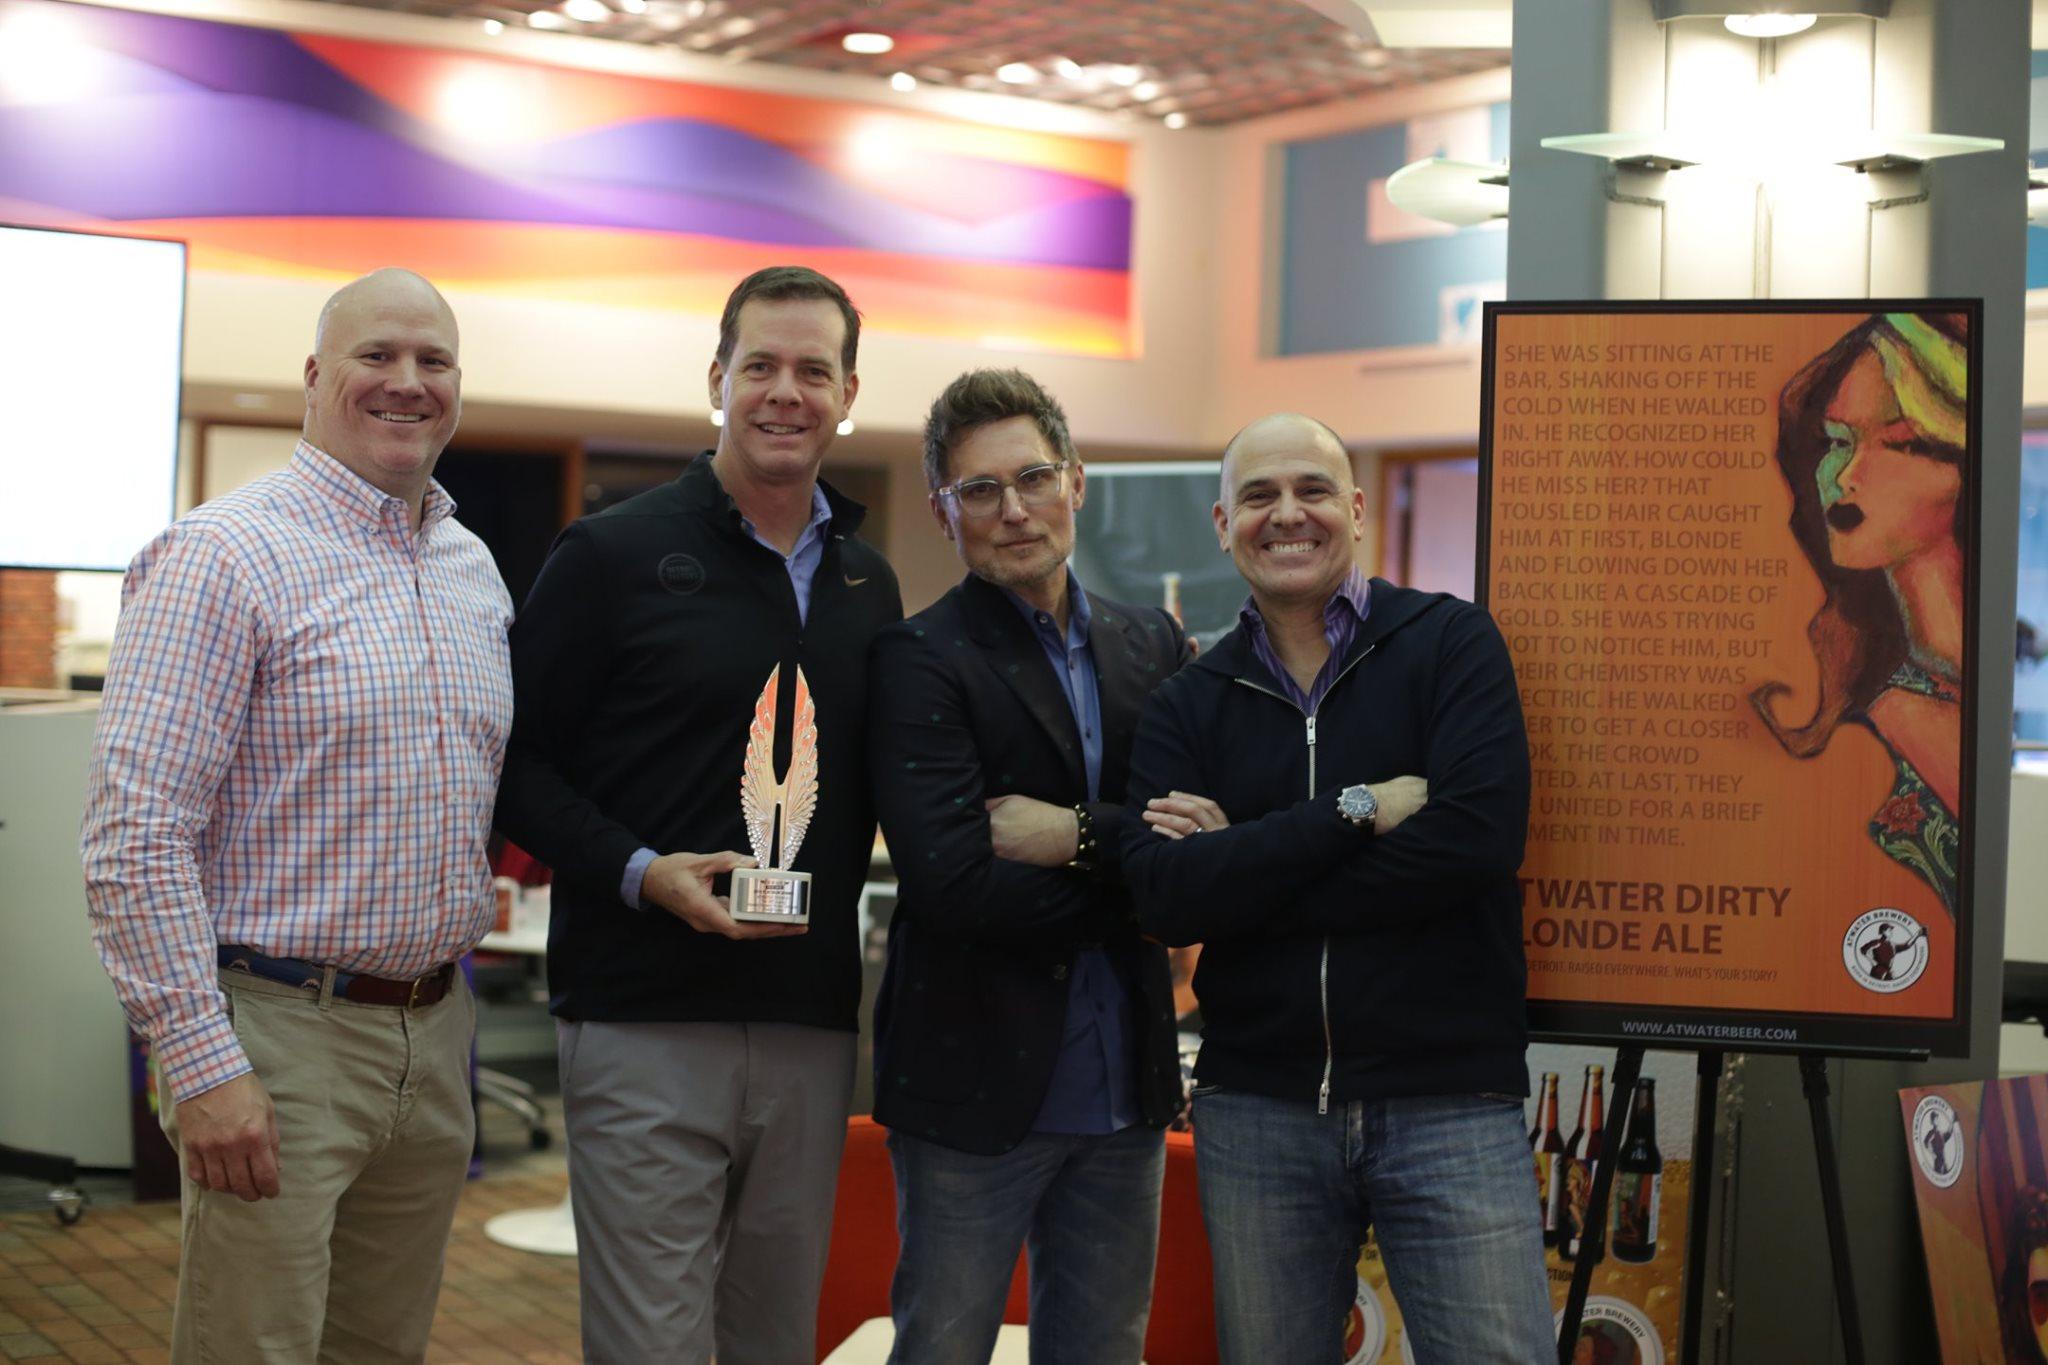 Four men holding an awards